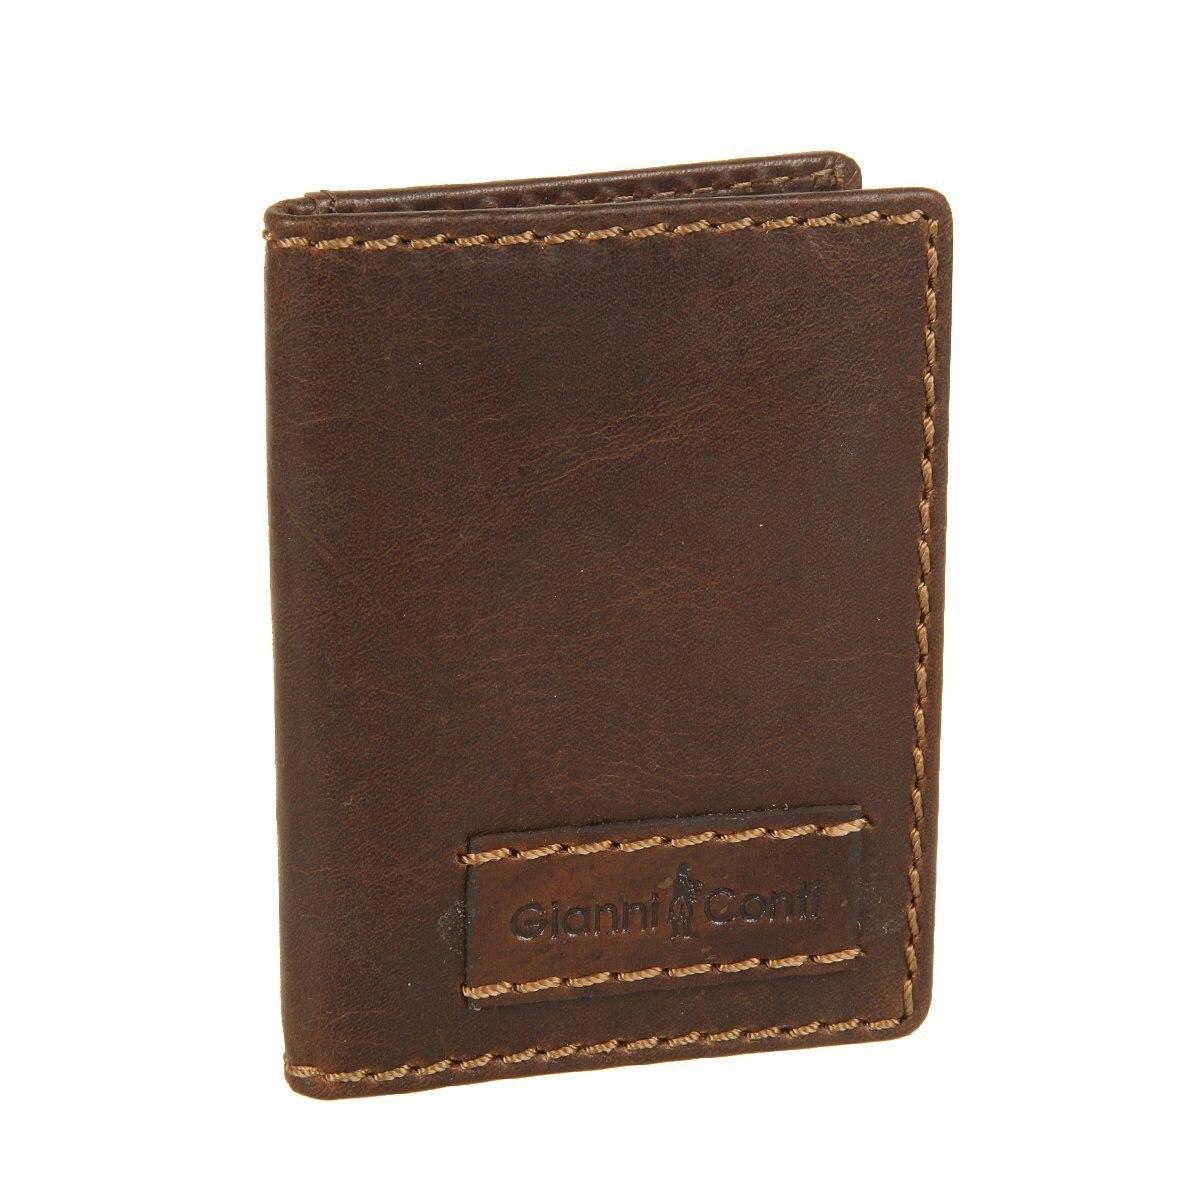 Credit Card Cases Gianni Conti 1227189 dark brown